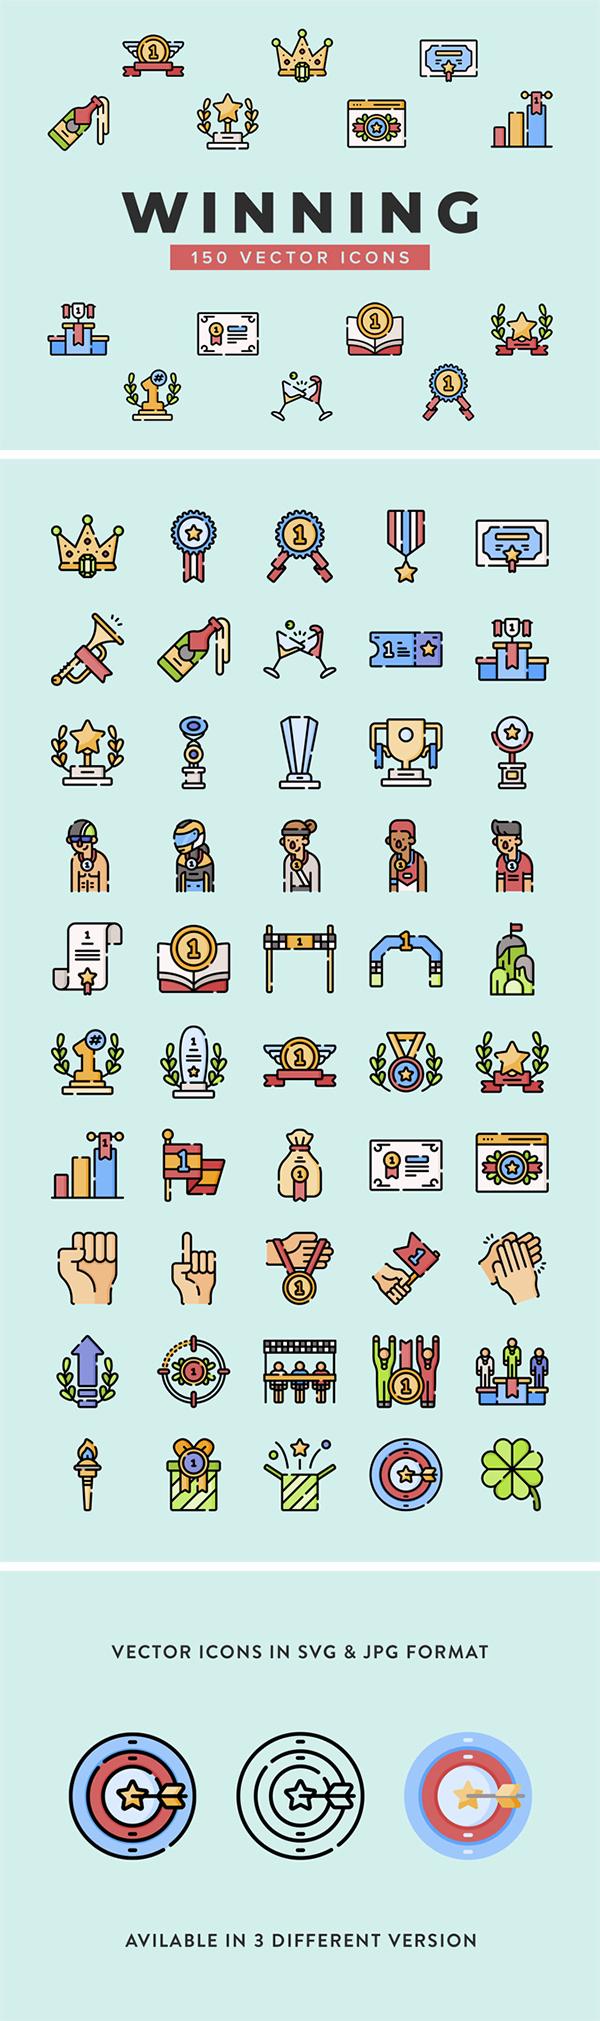 Winning Vector Icons